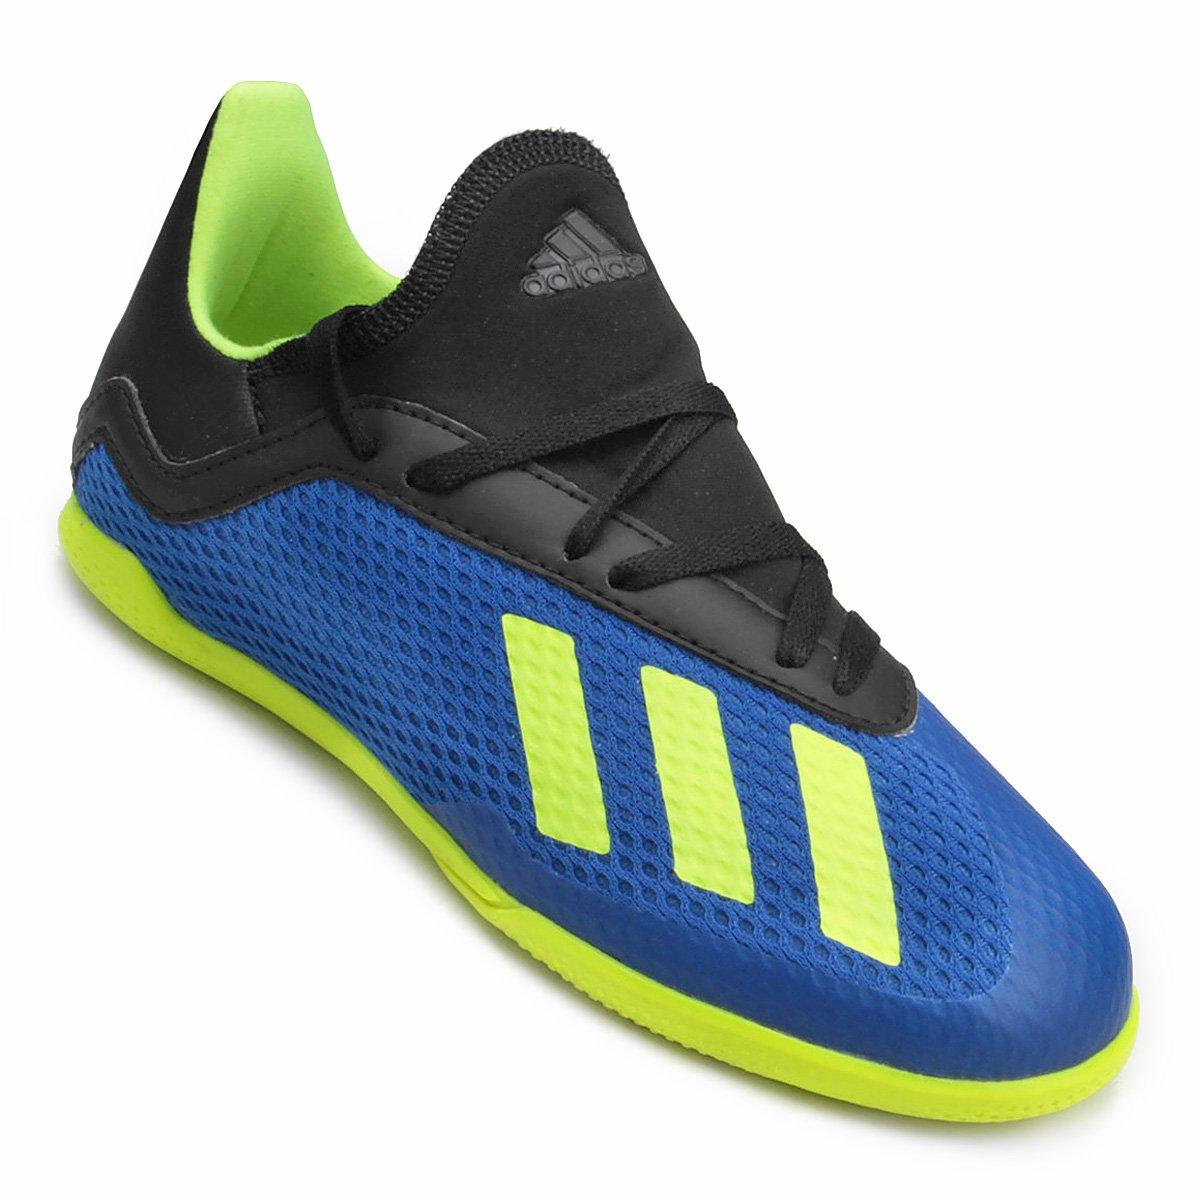 ccbc835c943d5 Chuteira Futsal Infantil Adidas X Tango 18 3 IN - Compre Agora